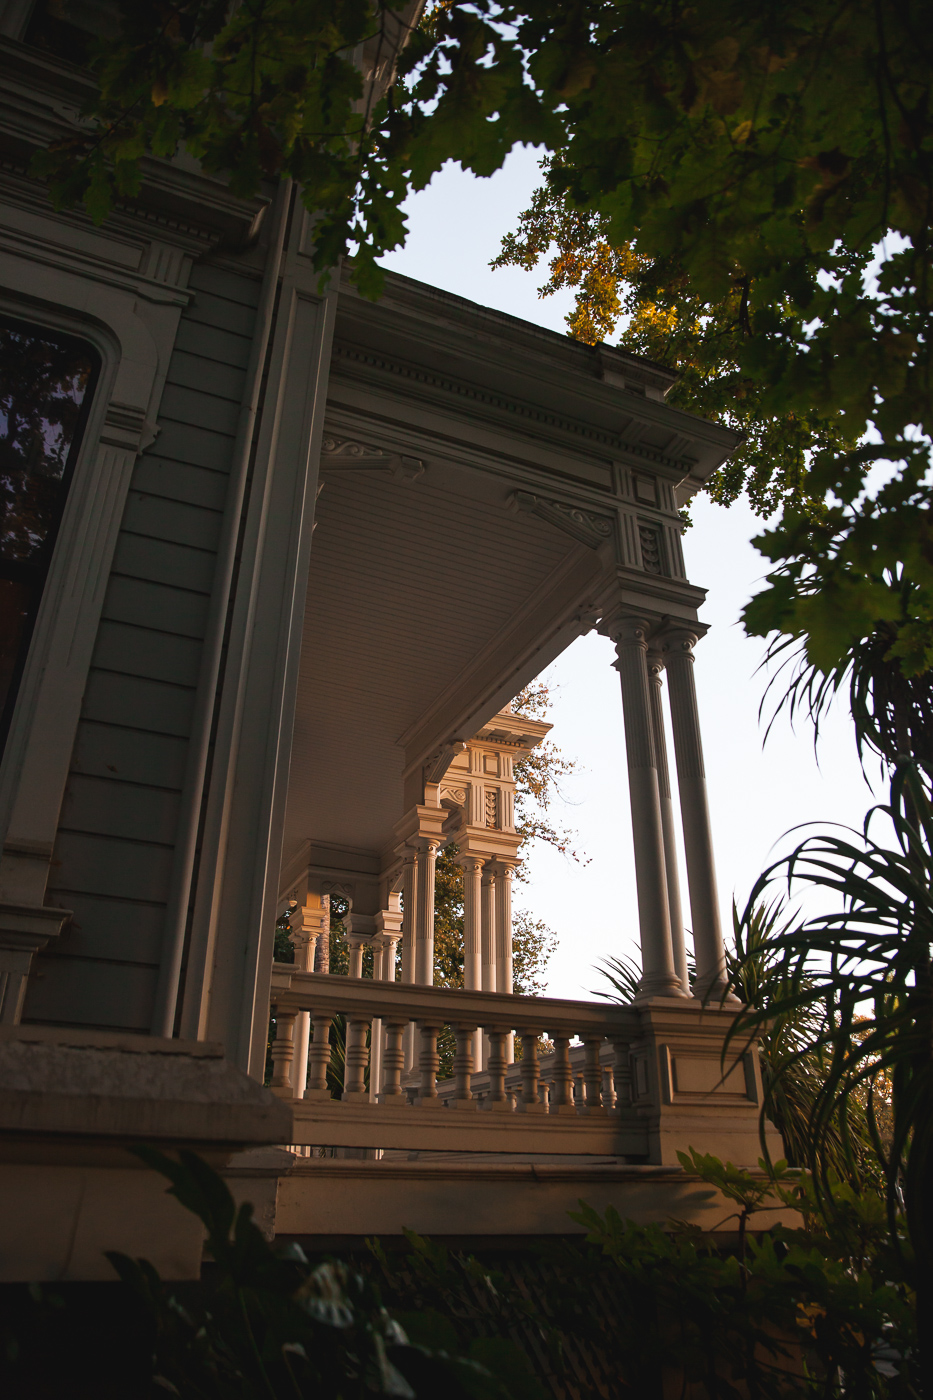 mchenry mansion exterior